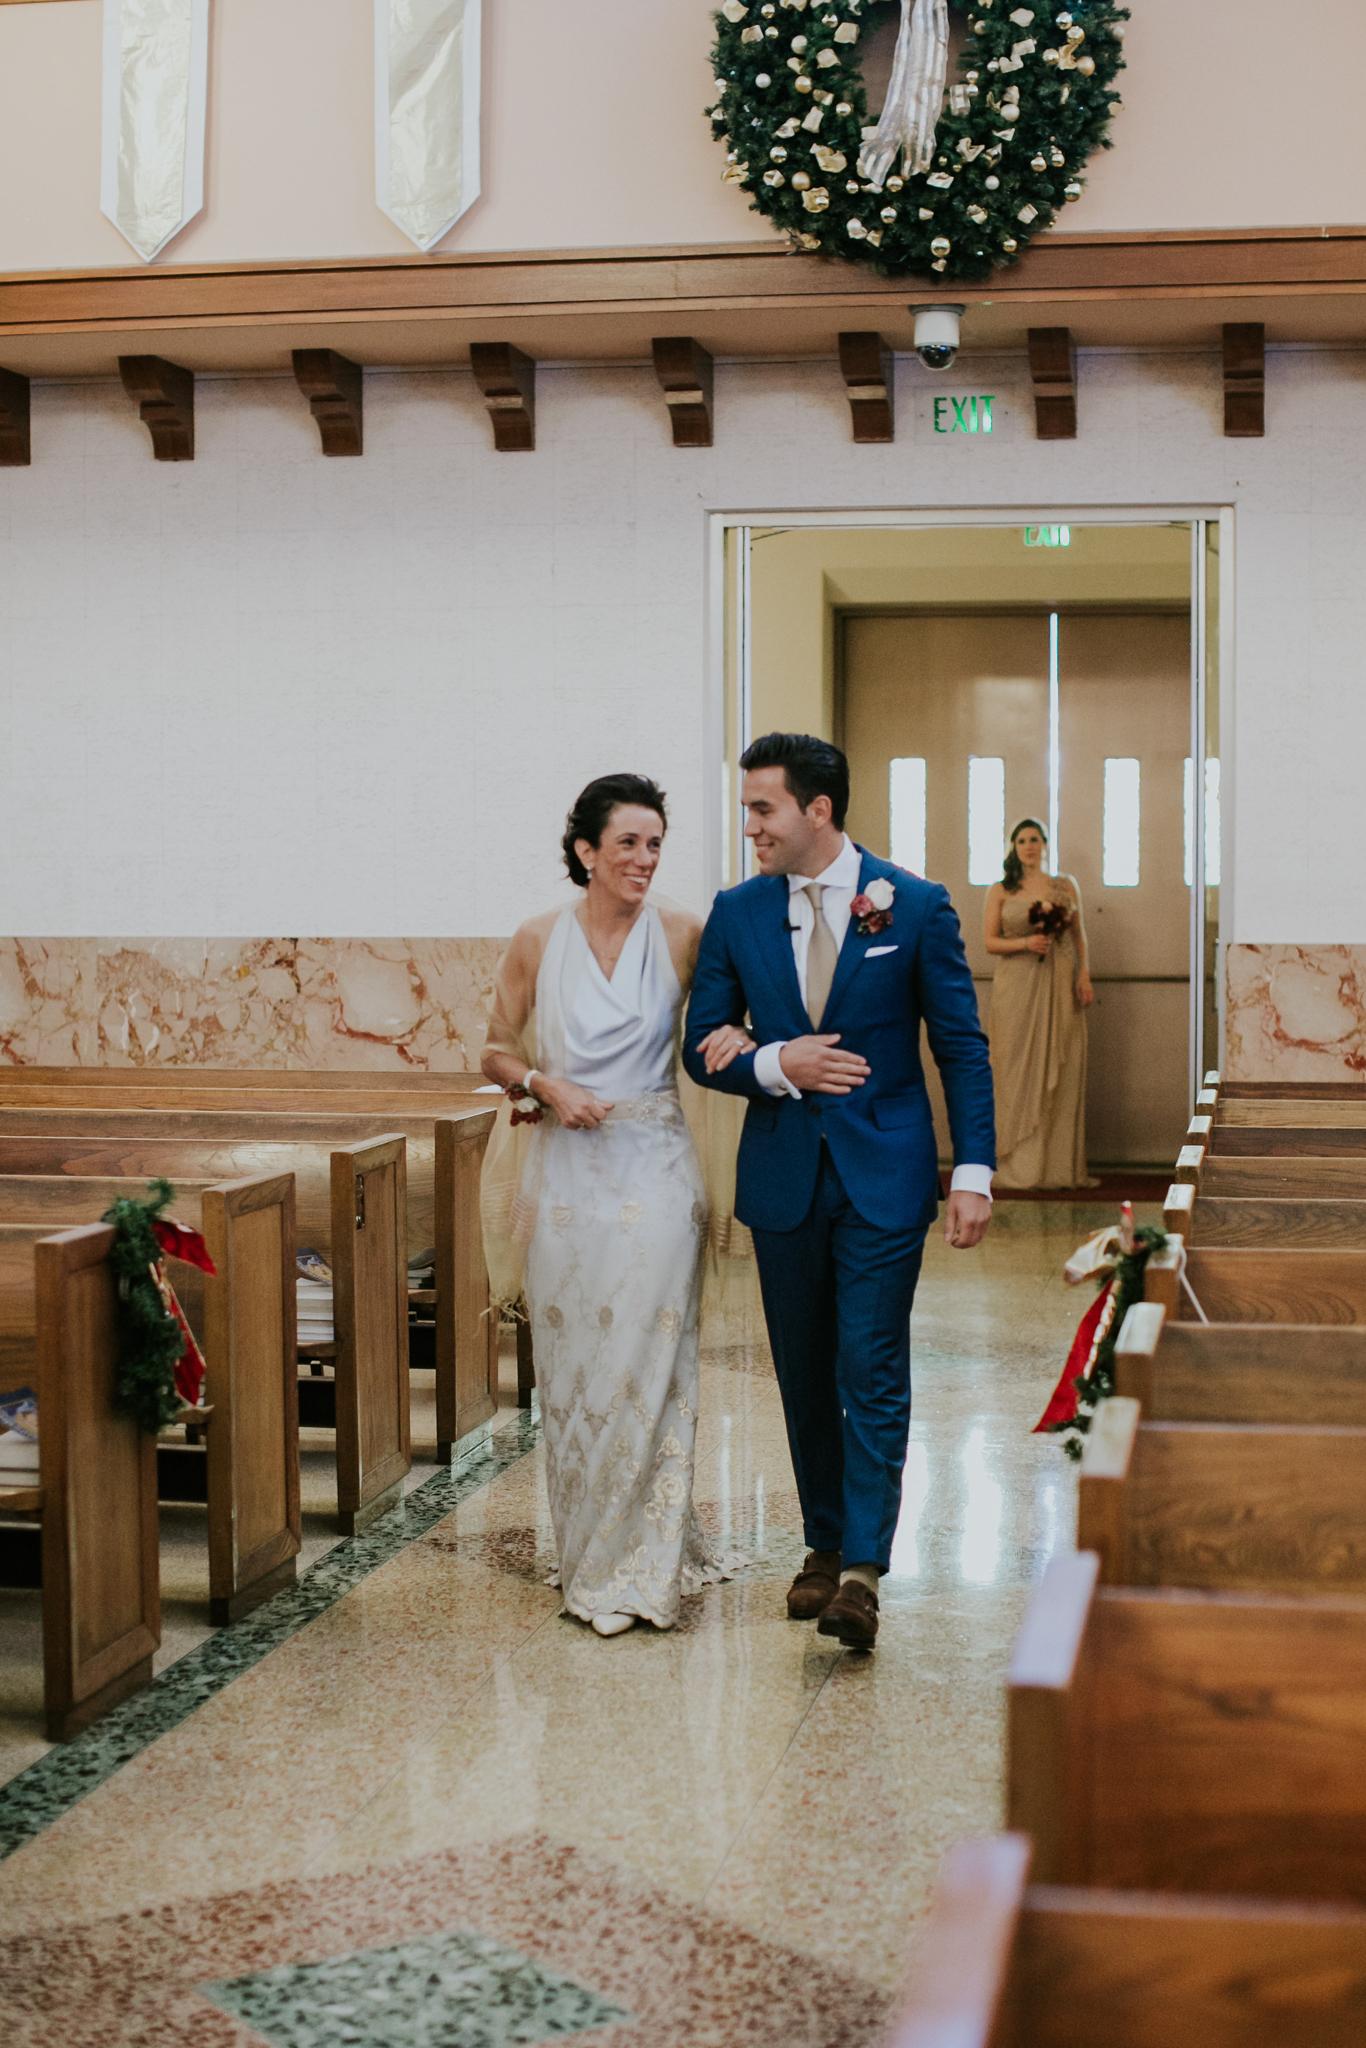 20151230_hussem_wedding_0330_web.jpg